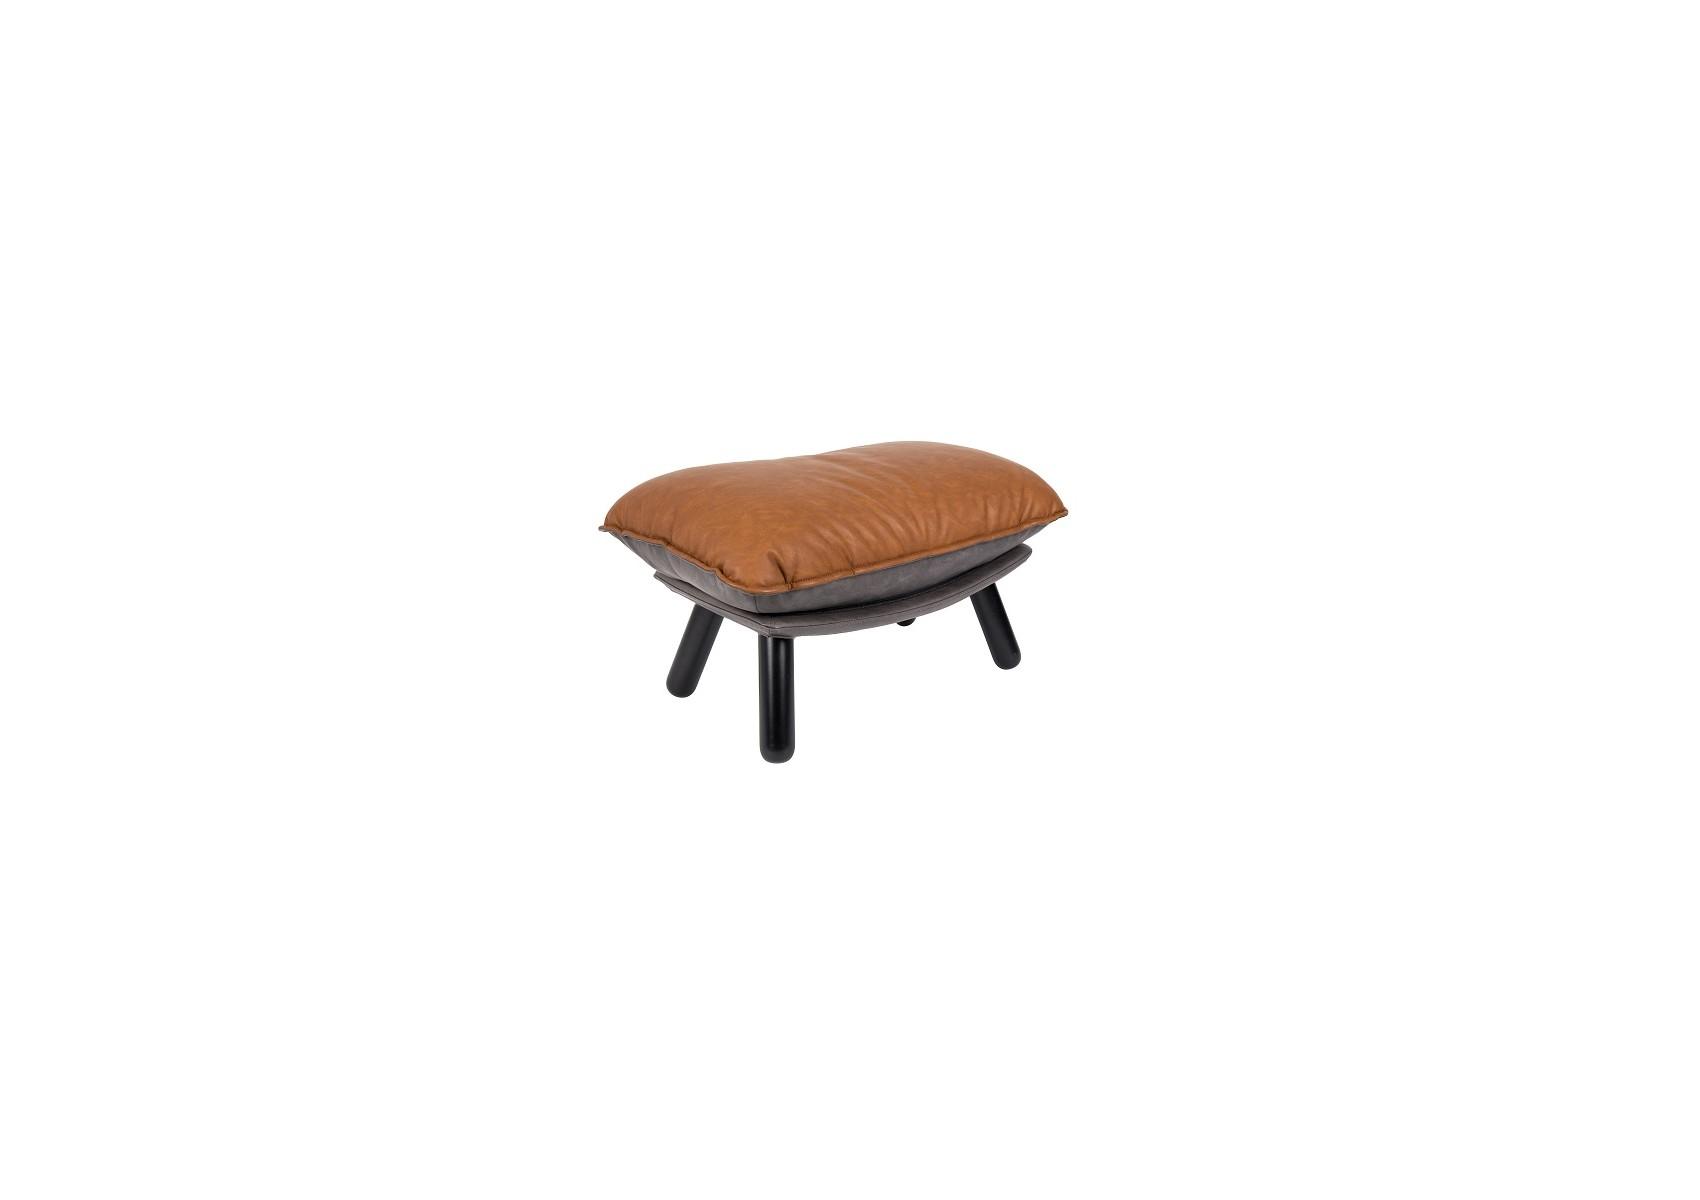 repose pied design hocker de la collection lazy sack de. Black Bedroom Furniture Sets. Home Design Ideas